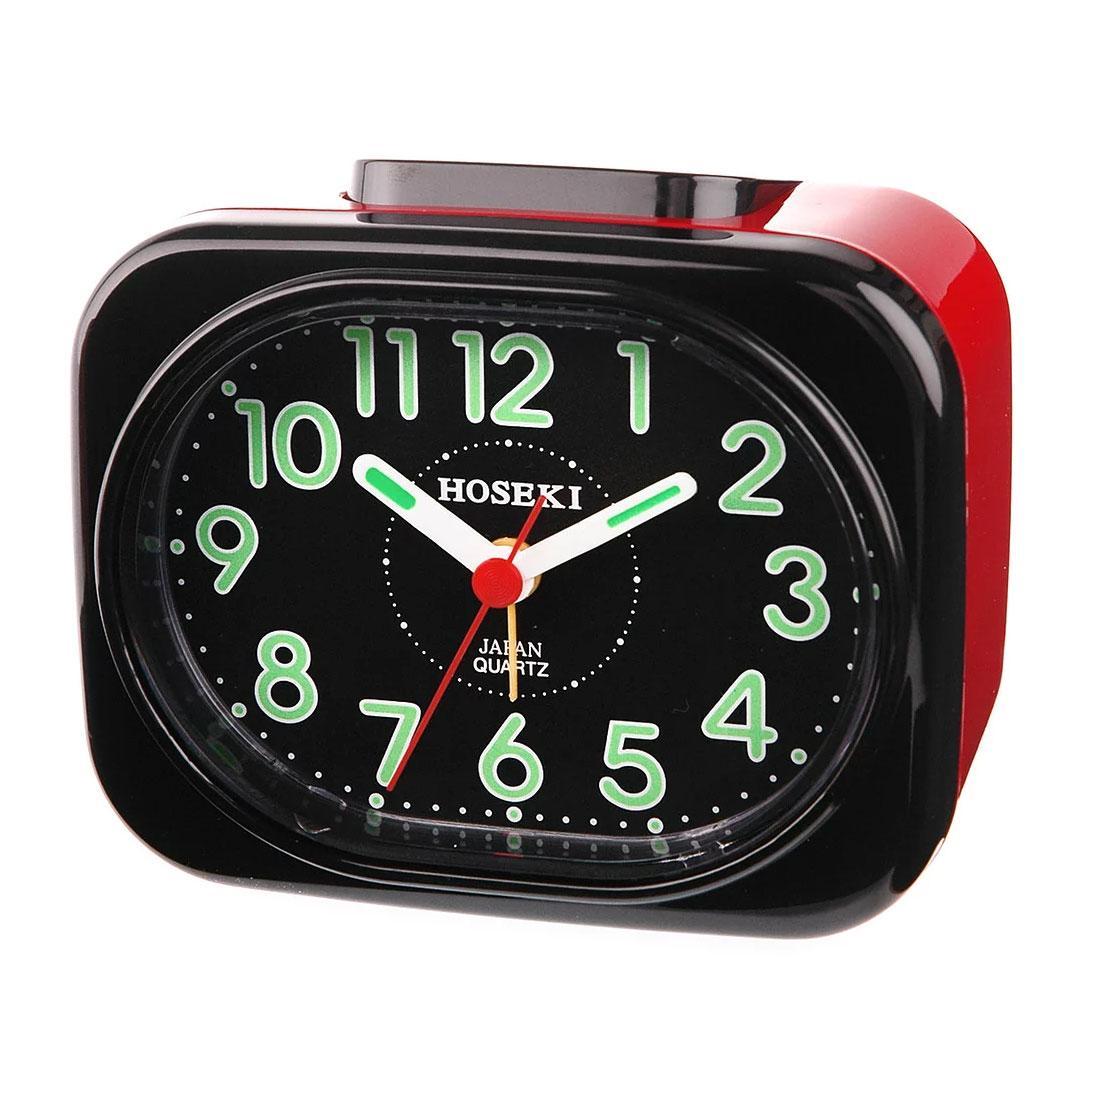 Hoseki Black Case and Dial Alarm Clock H-9053 H-9053BK/BK